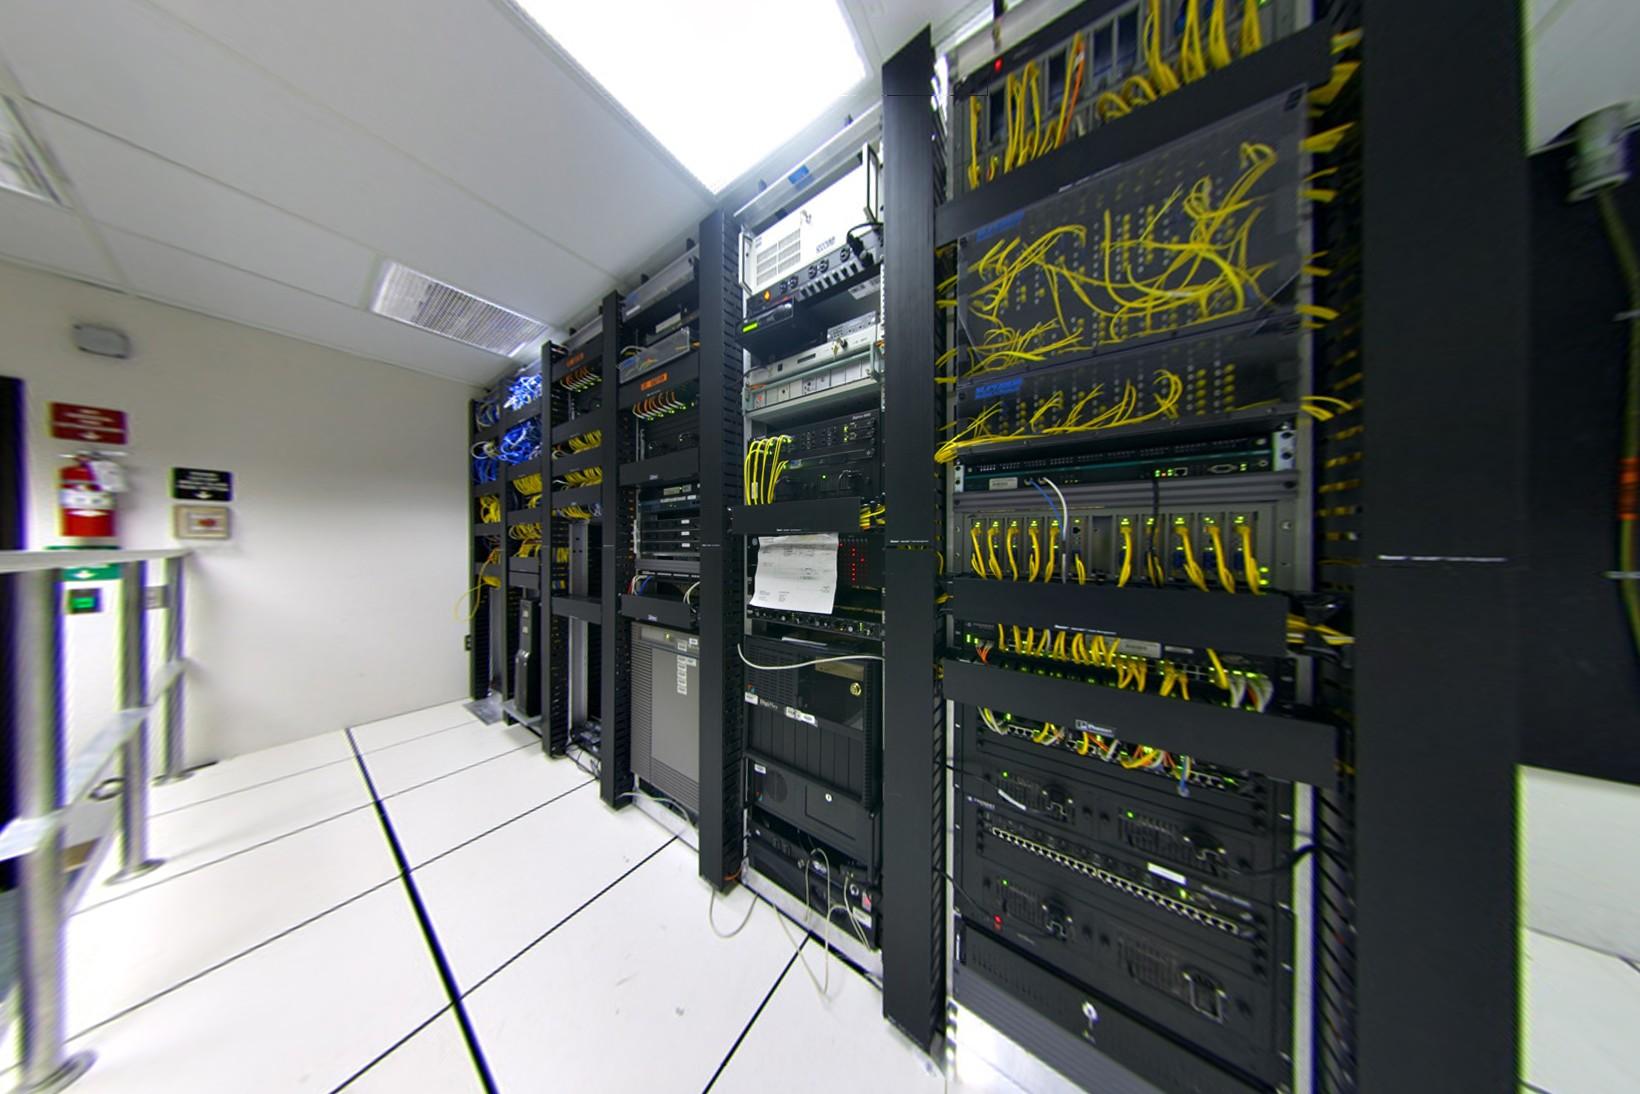 File Datacenter Telecom Rectilinear Cropped Jpg